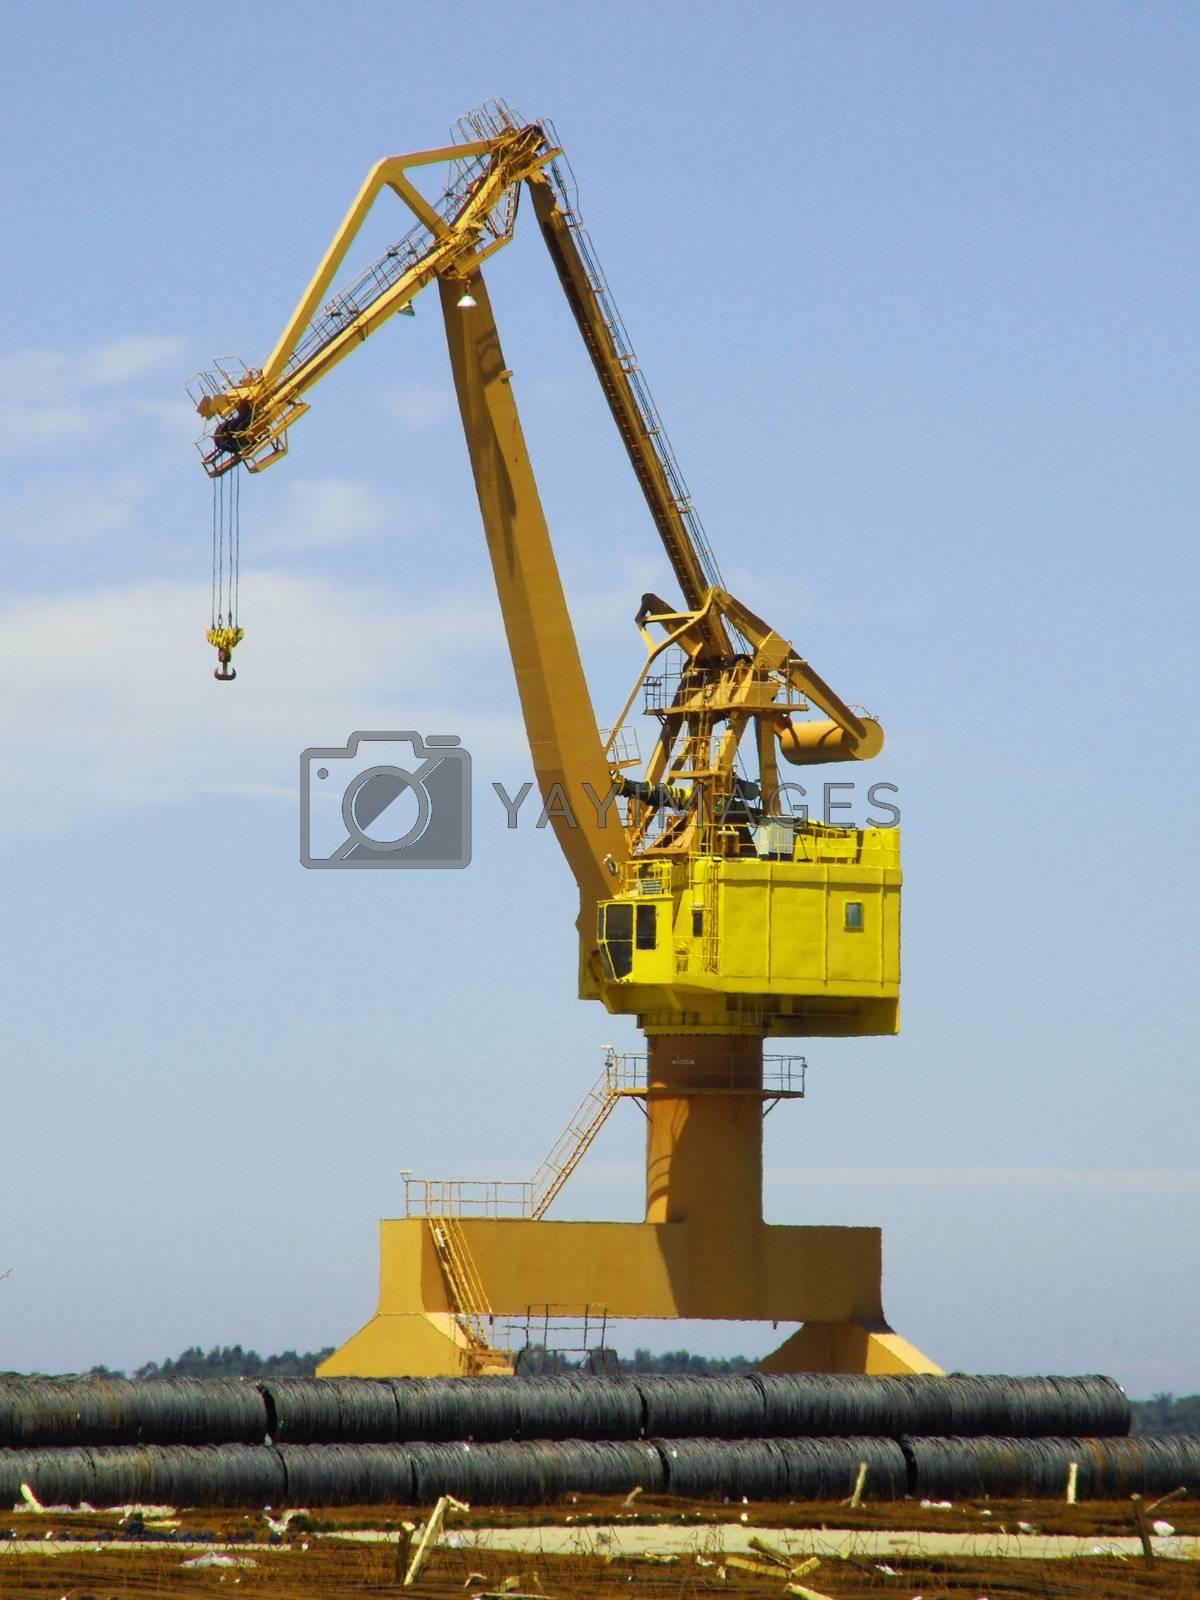 Dock crane by PauloResende